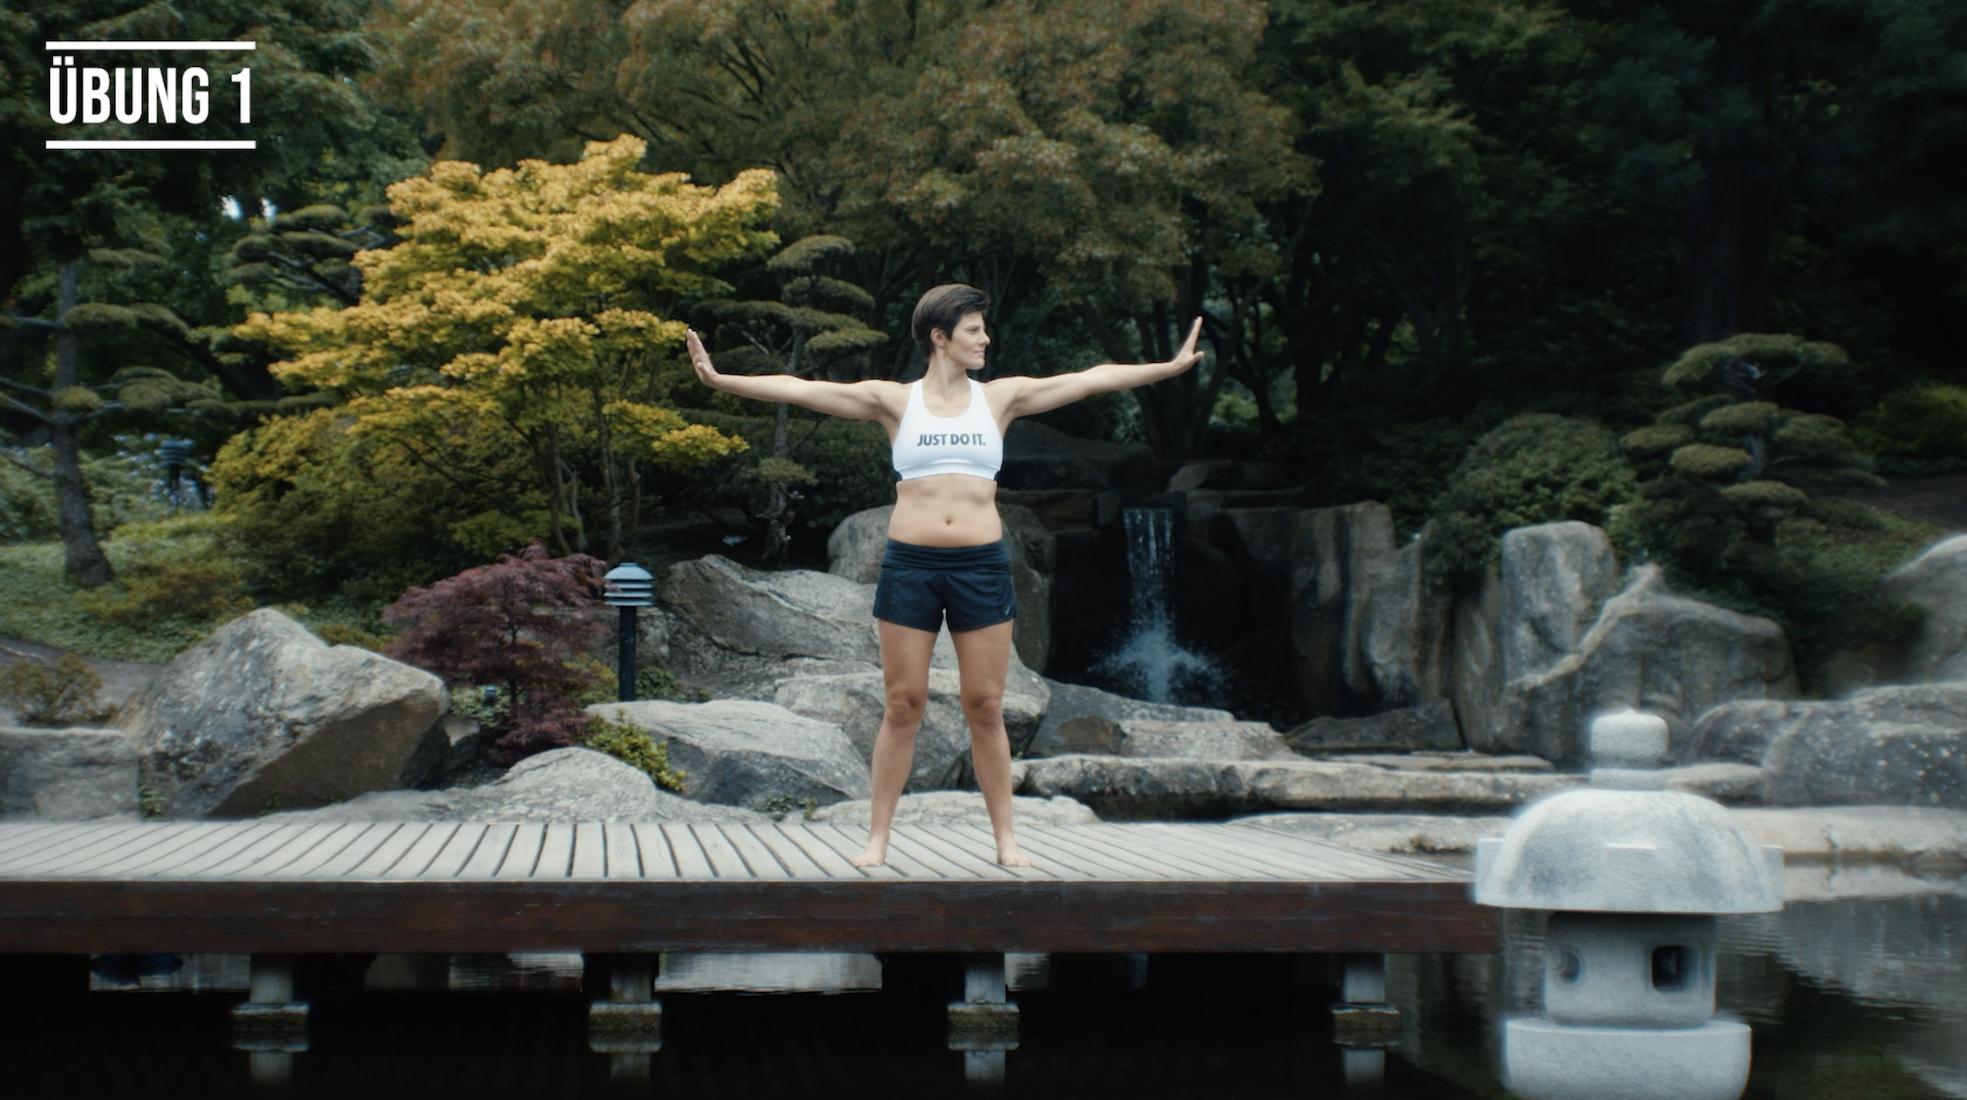 Shaolin Übung aus dem Videokurs